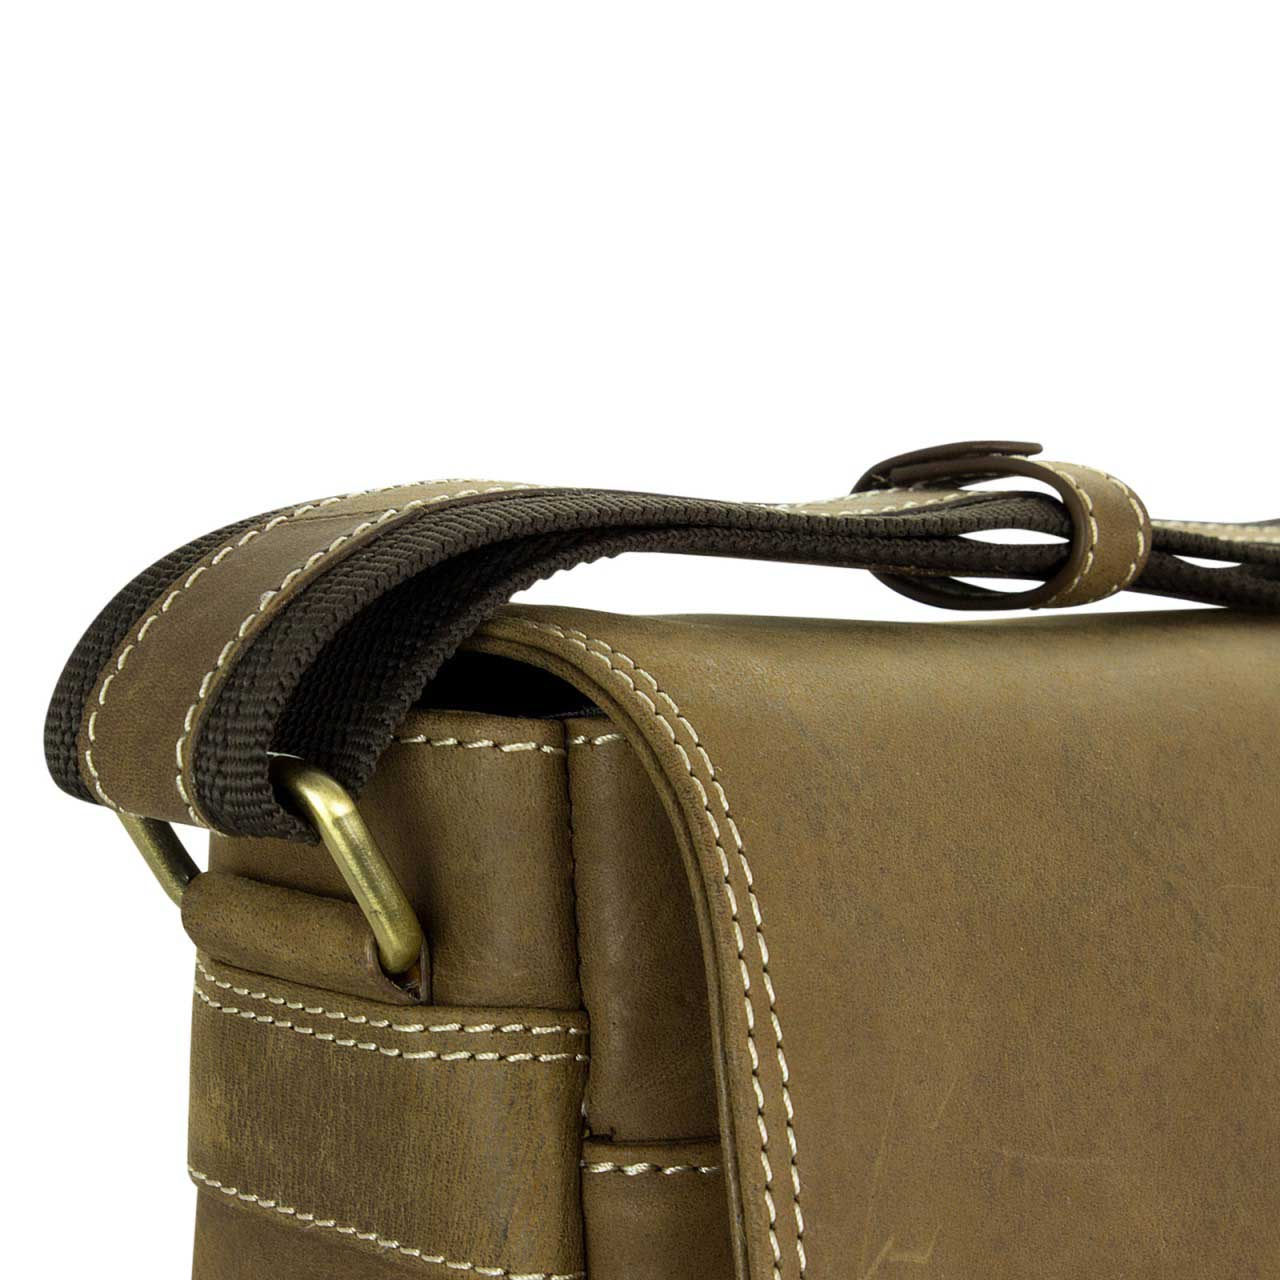 STILORD Ledertasche Umhängetasche 15.6 Zoll Laptoptasche aus echtem Büffel-Leder braun  - Bild 6